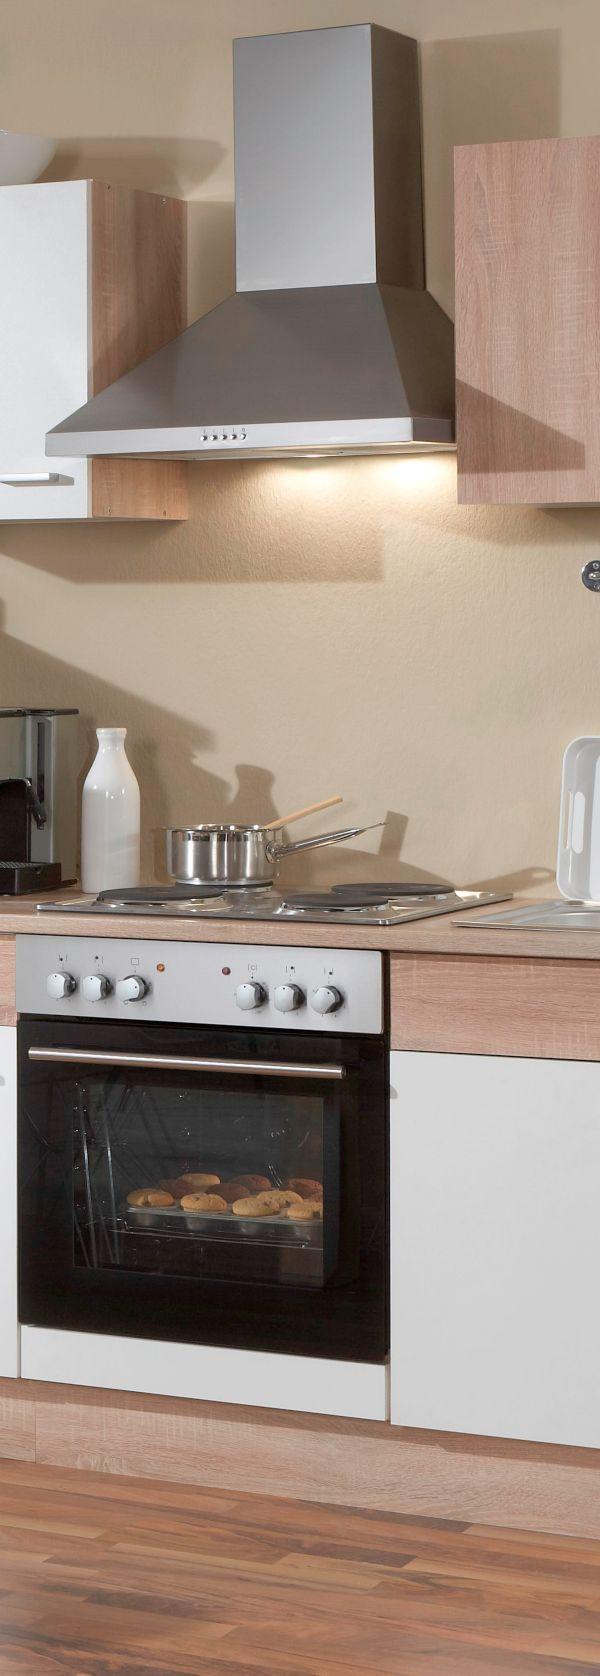 menke k chen k chenzeile sonja 270 cm ohne geschirrsp ler vers varianten ebay. Black Bedroom Furniture Sets. Home Design Ideas